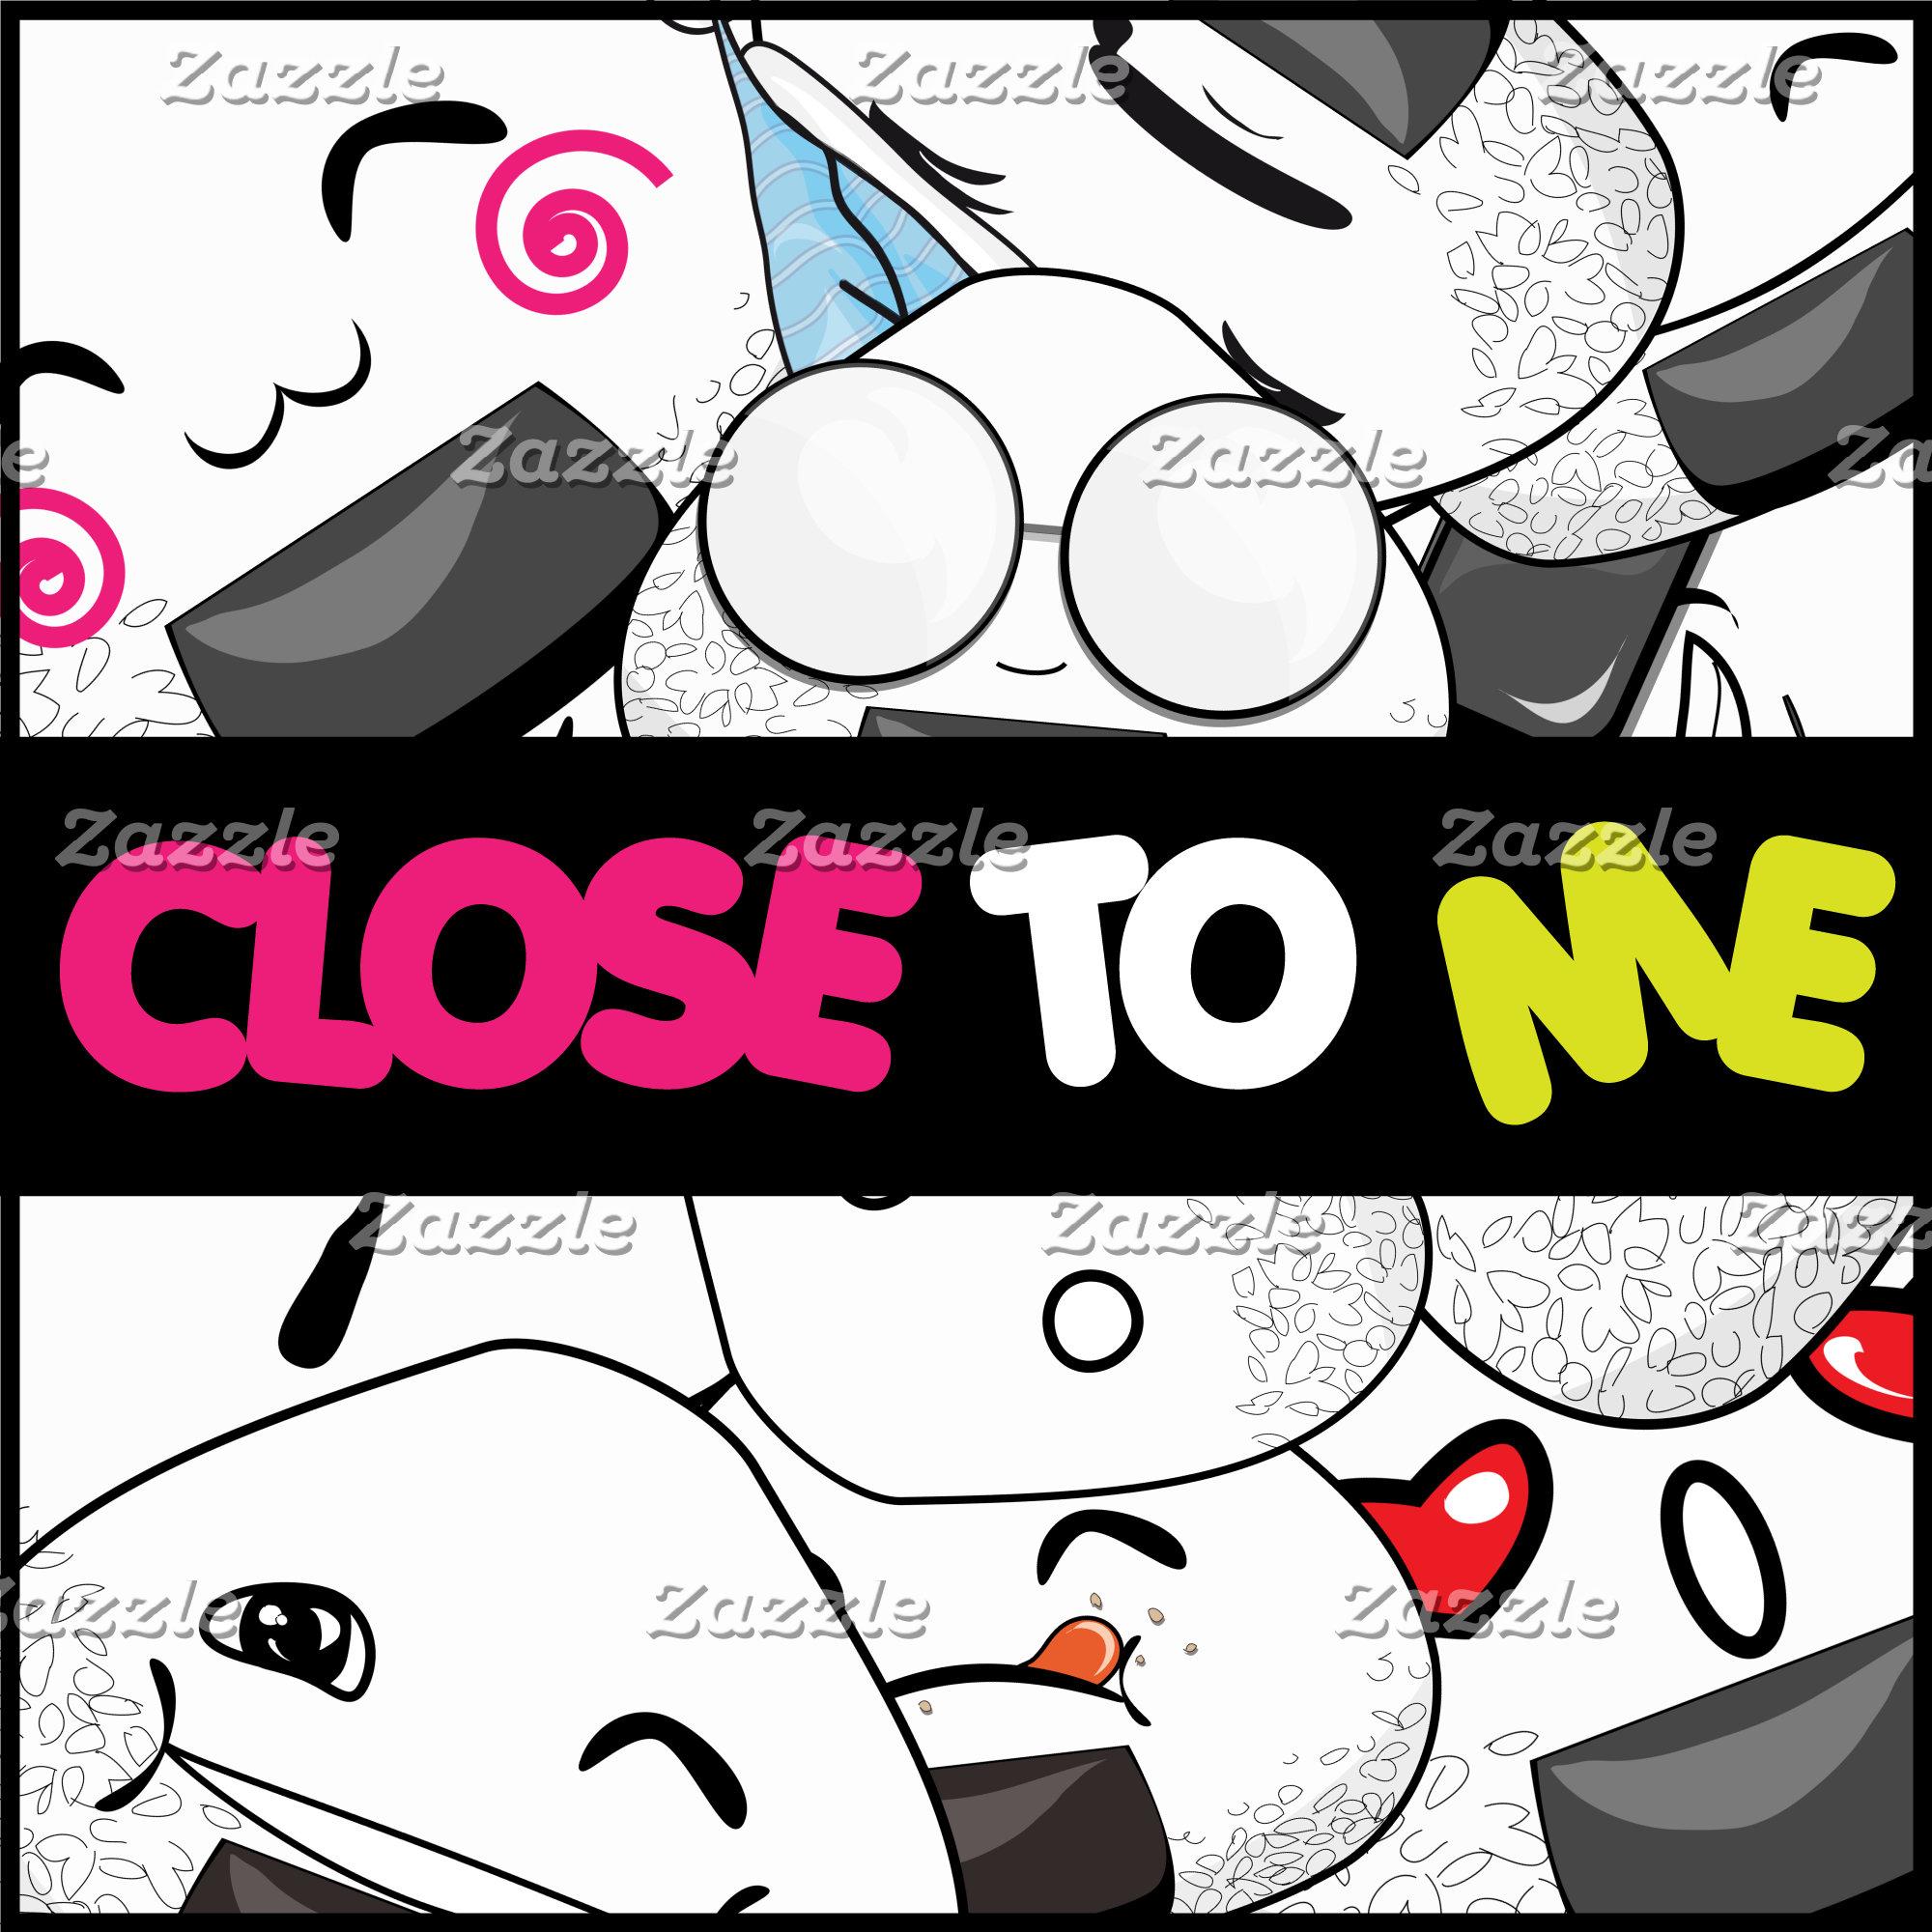 CLOSE TO ME